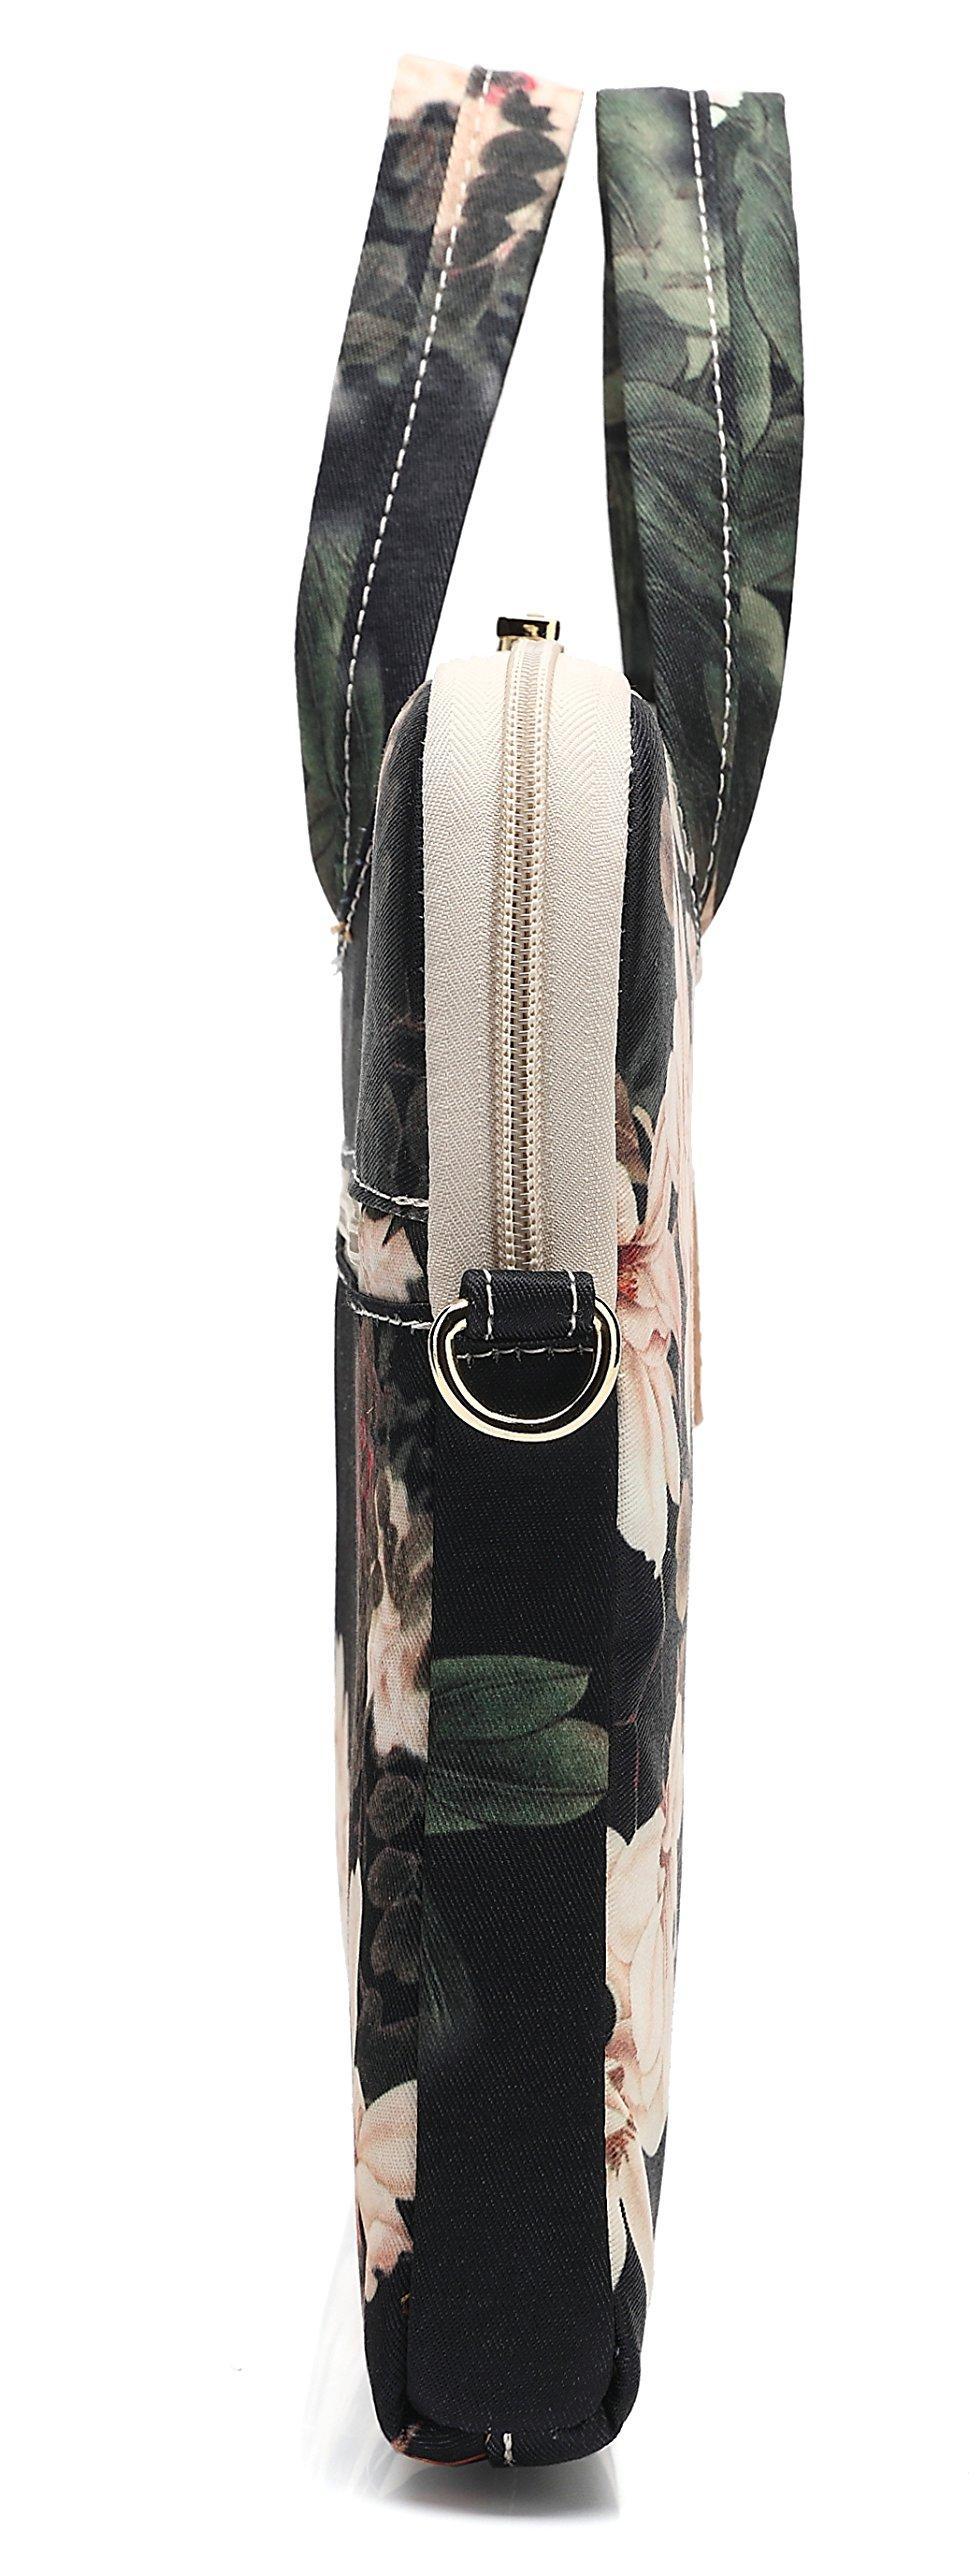 DACHEE Black Peony Patten Waterproof Laptop Shoulder Messenger Bag Case Sleeve for 14 Inch 15 Inch Laptop Case Laptop Briefcase 15.6 Inch by DACHEE (Image #6)